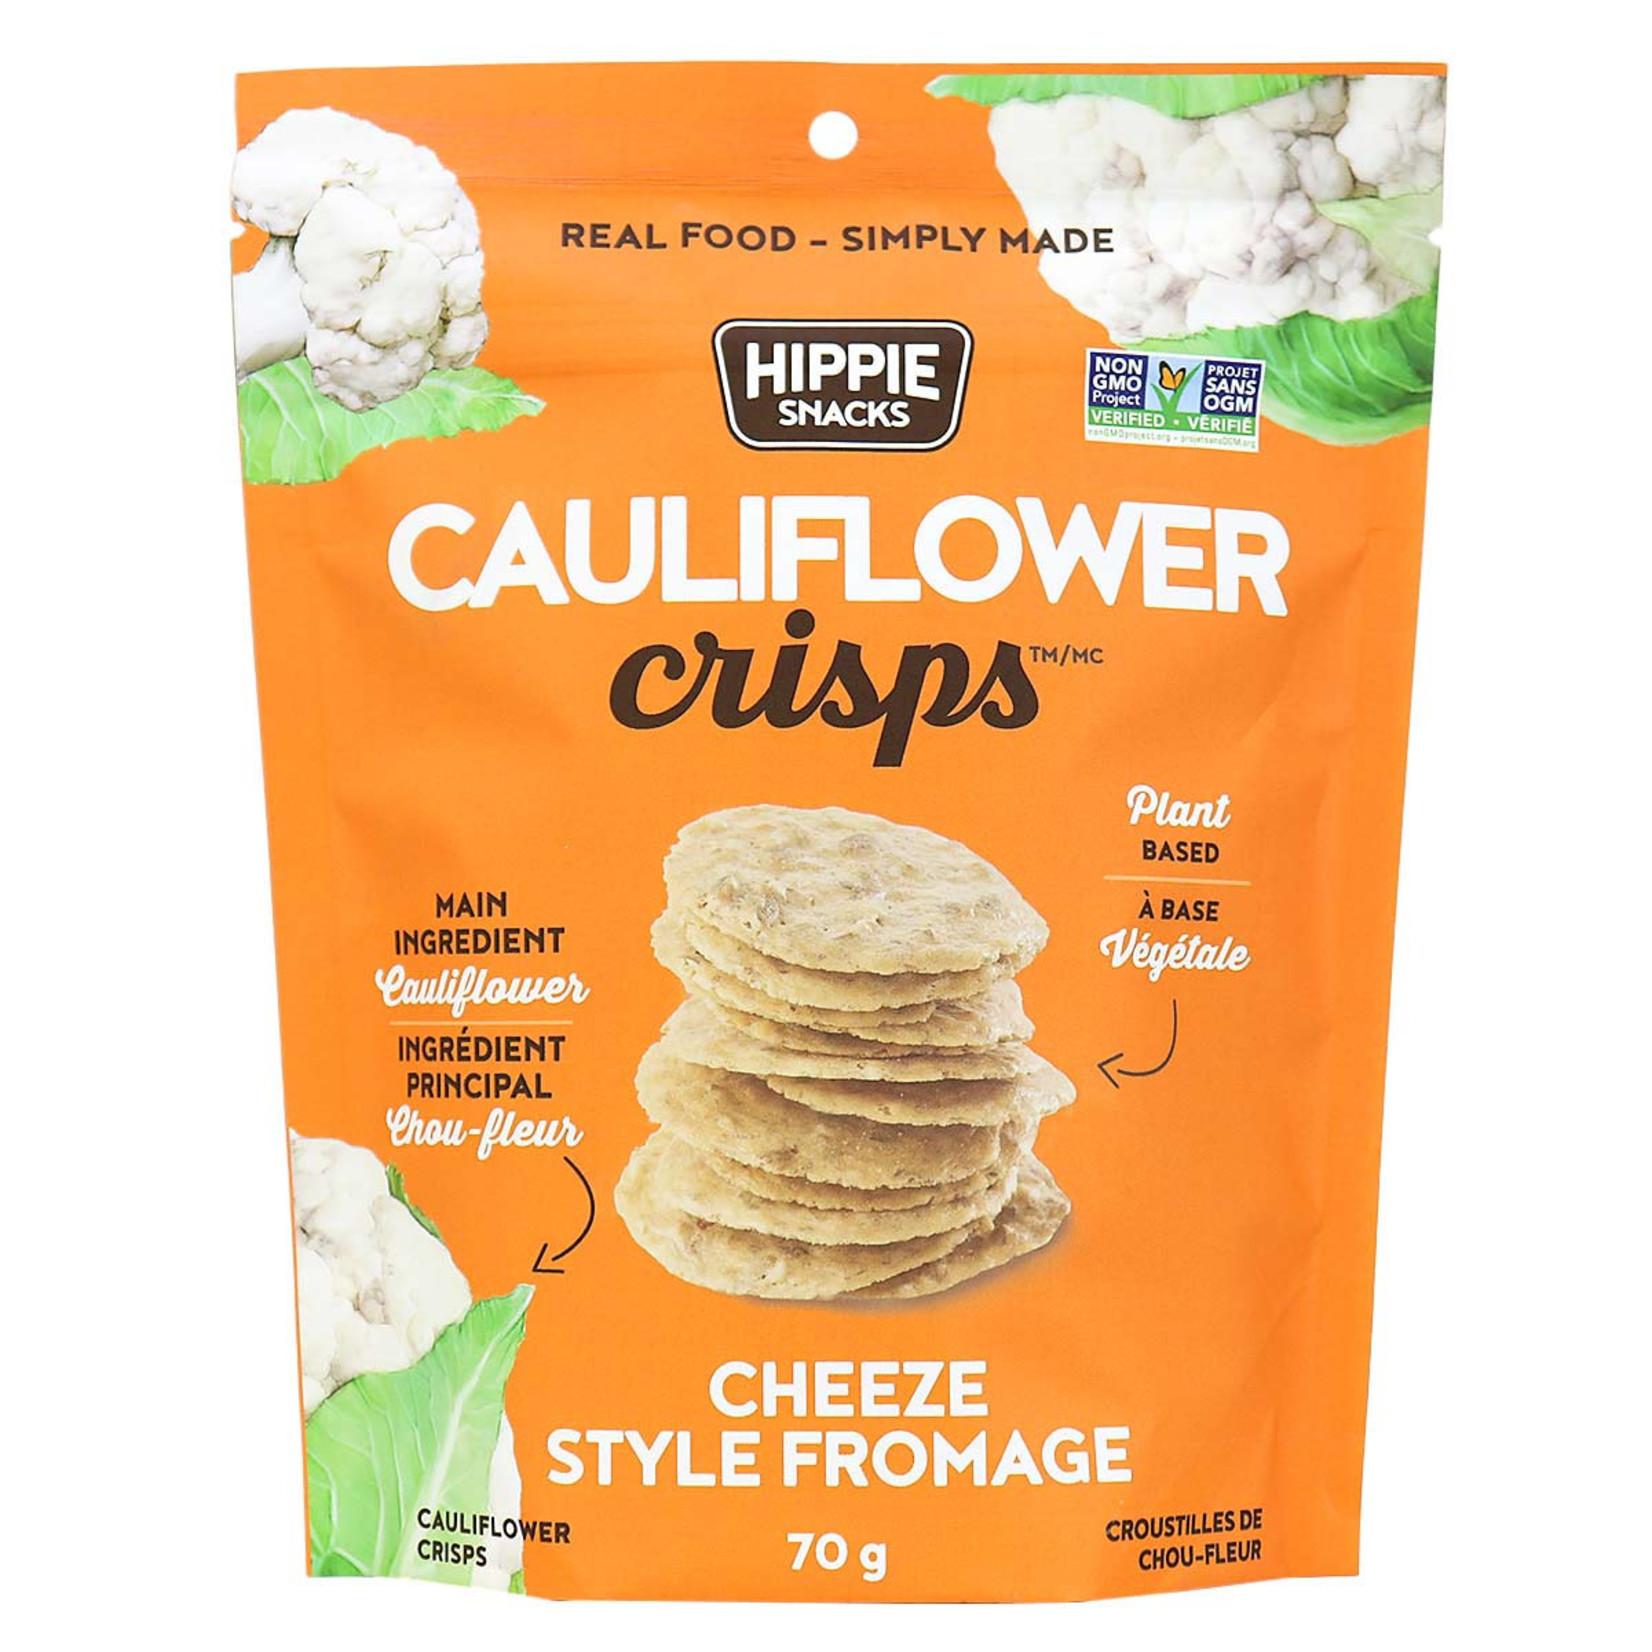 Hippie Snacks Cauliflower Crisps - Cheeze Style